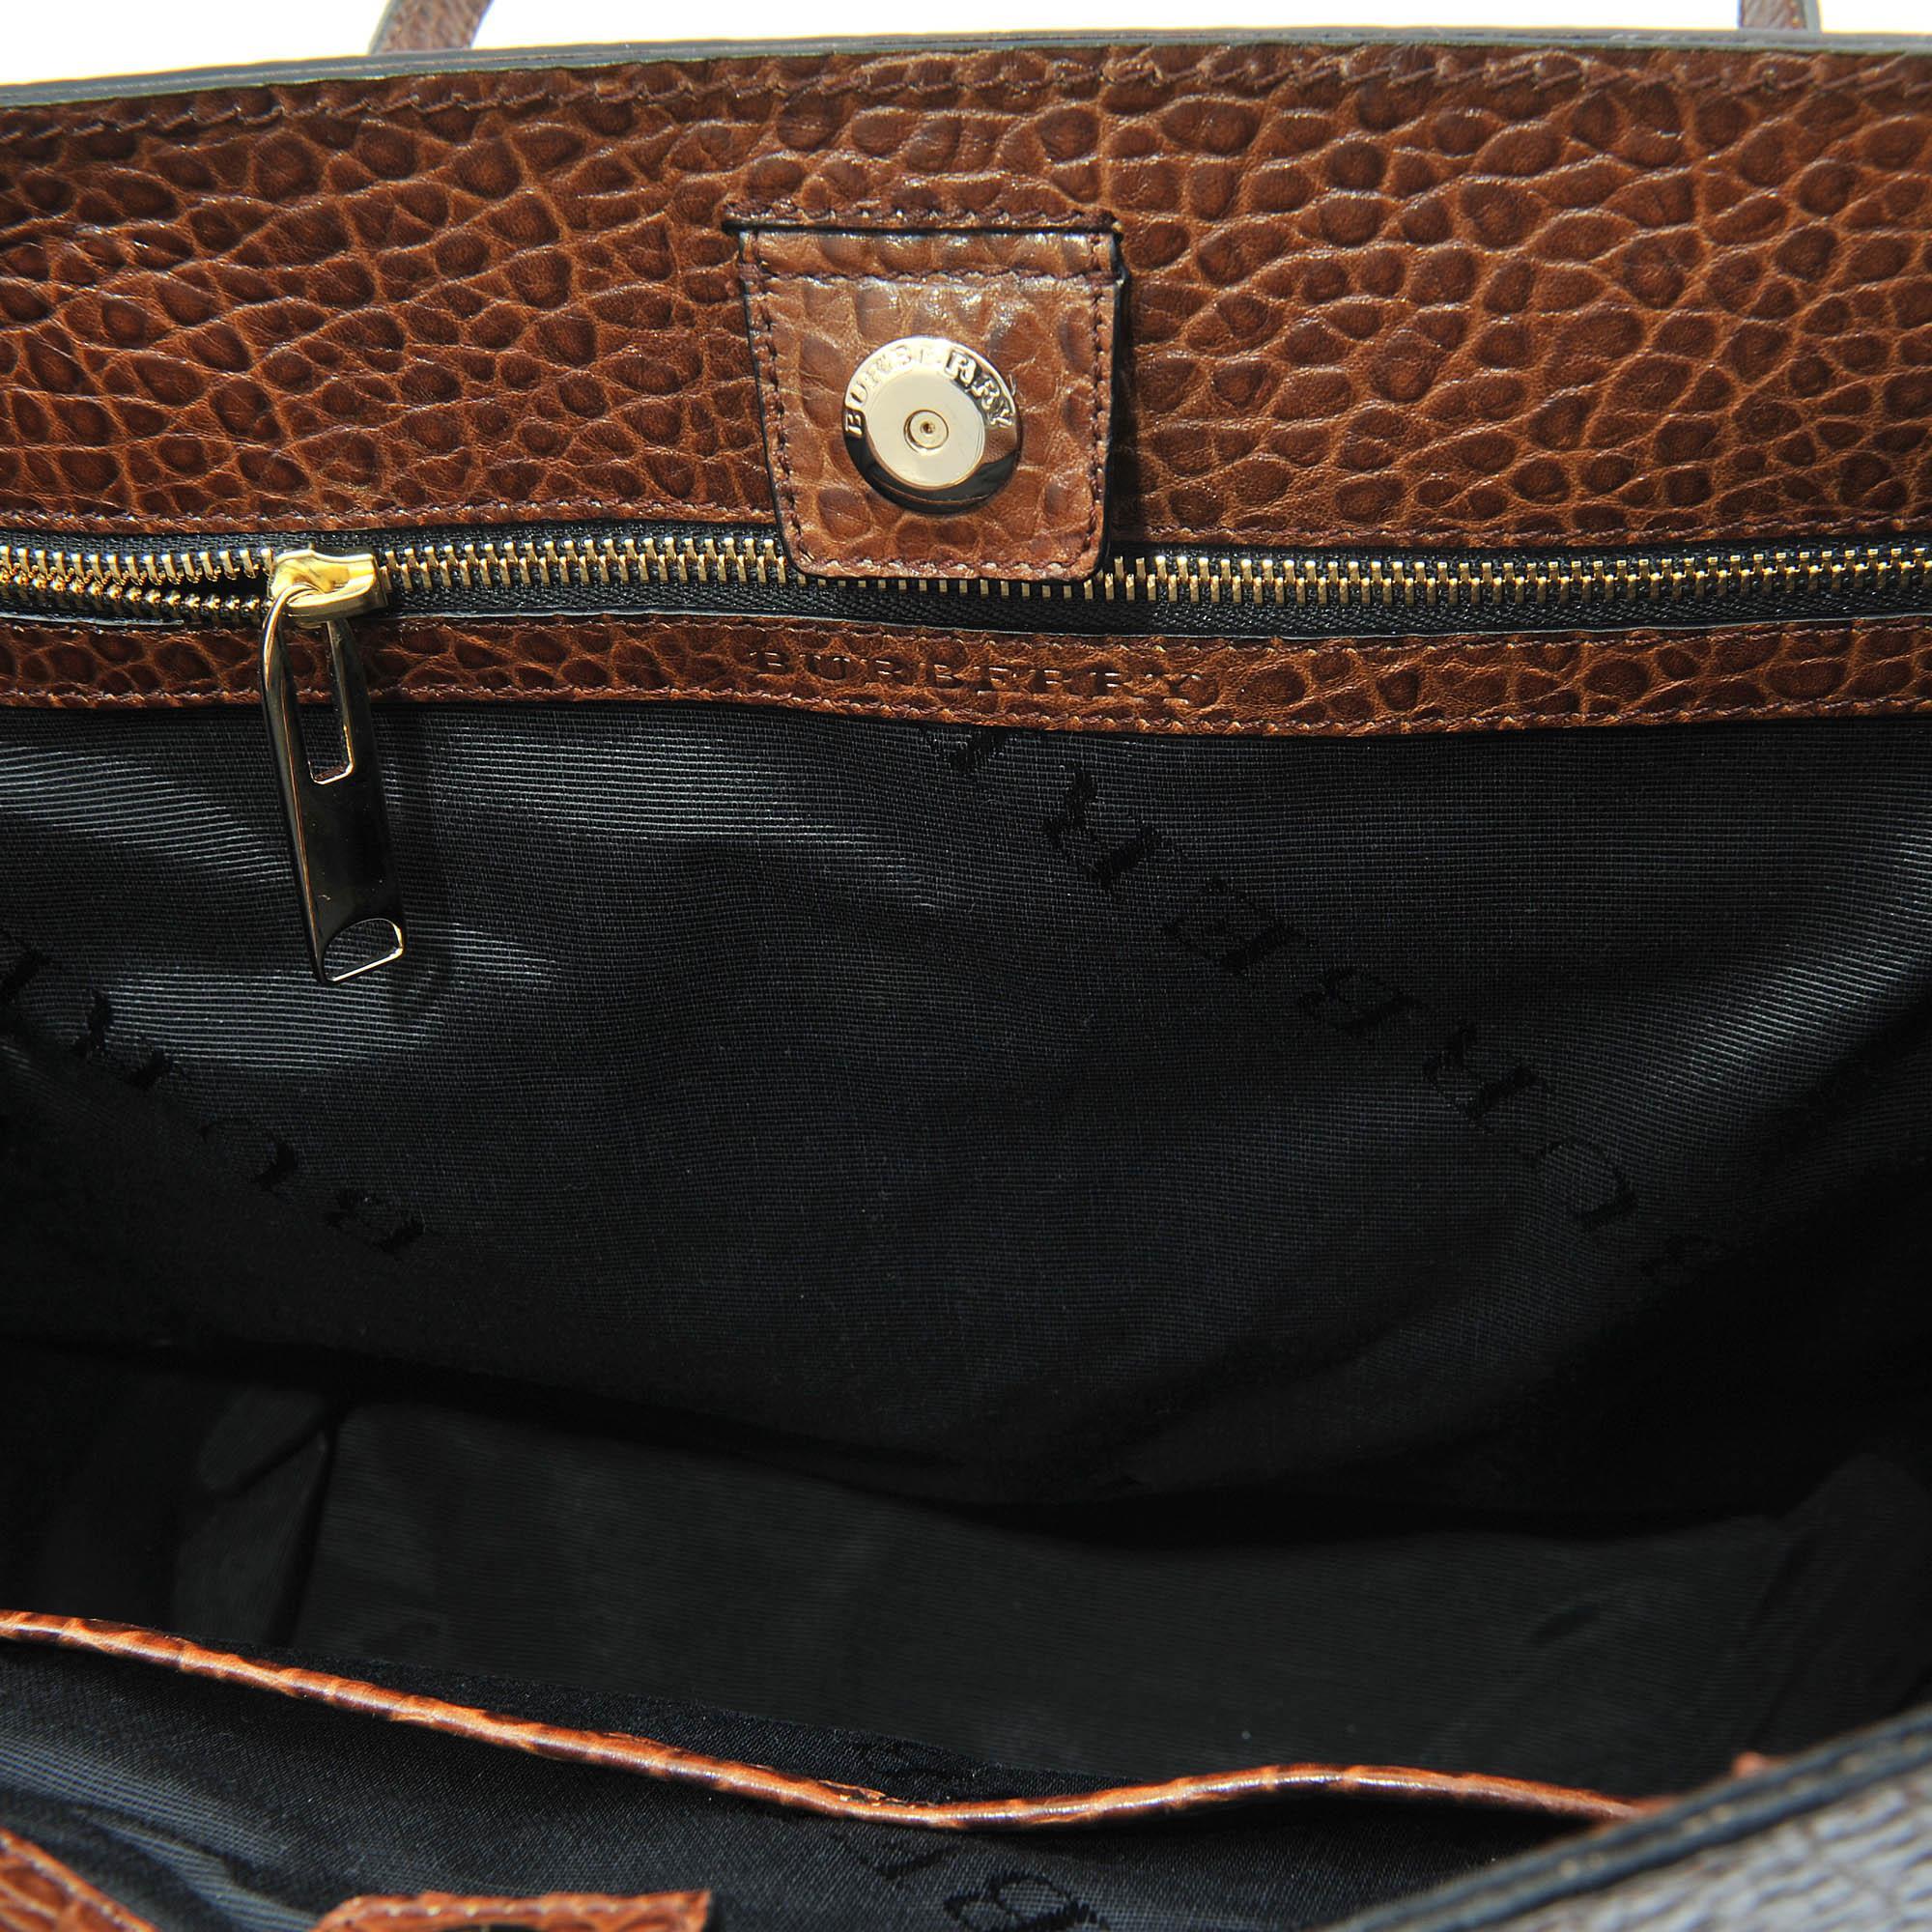 Burberry Medium Woodbury Tote Bag in Brown